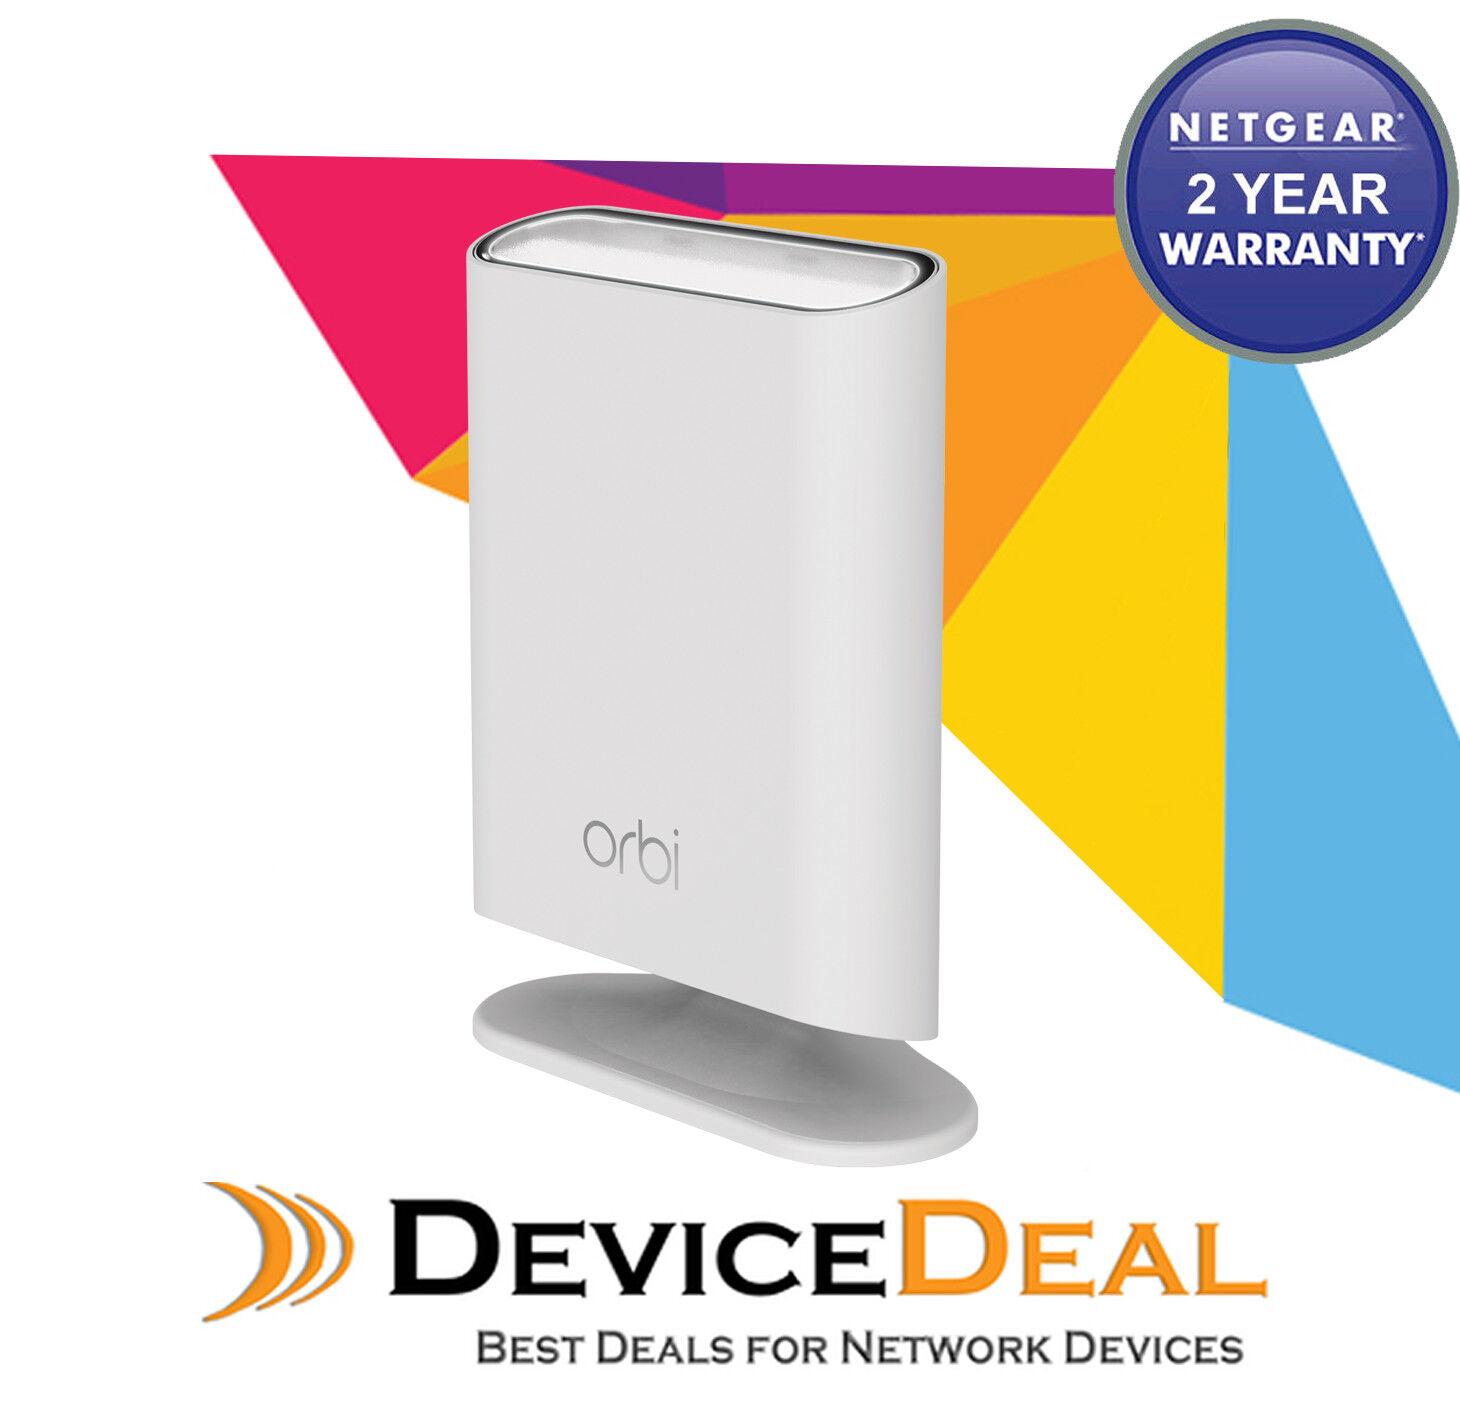 NETGEAR Orbi Outdoor AC3000 WiFi Mesh Extender & Add-on Sate